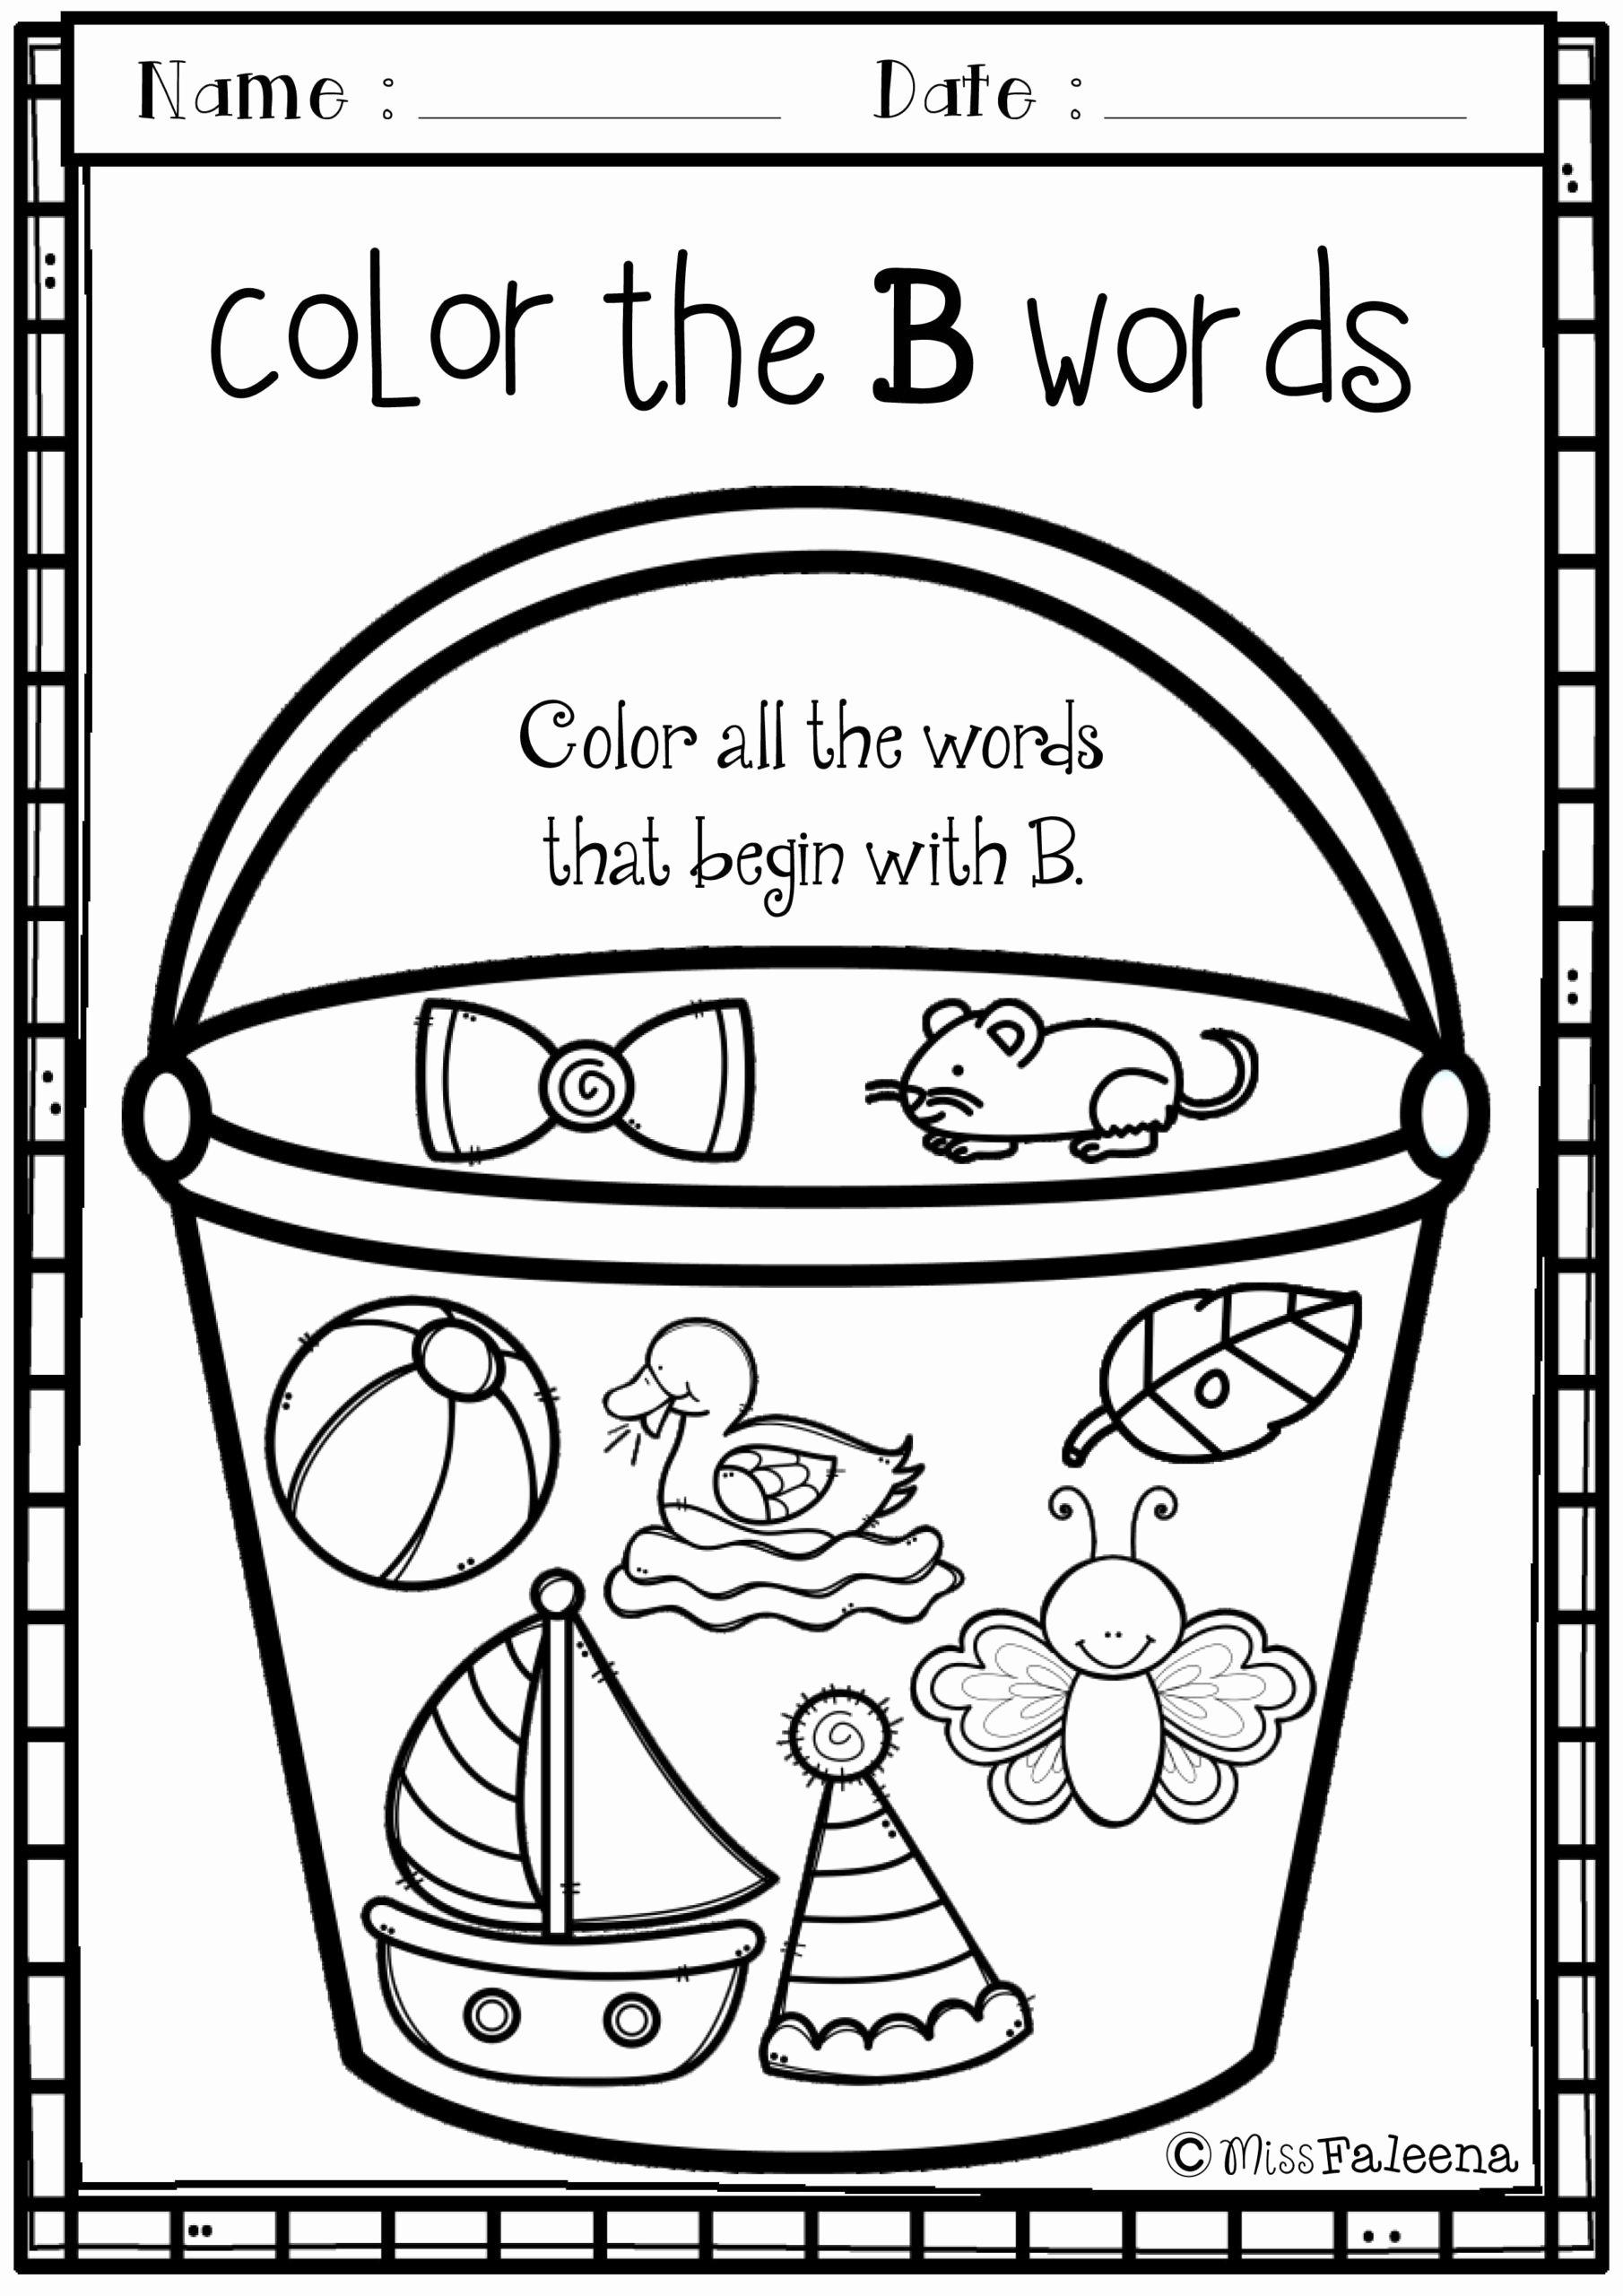 B Worksheets for Preschoolers Inspirational Worksheets Letter the Week is Designed to Help Teach